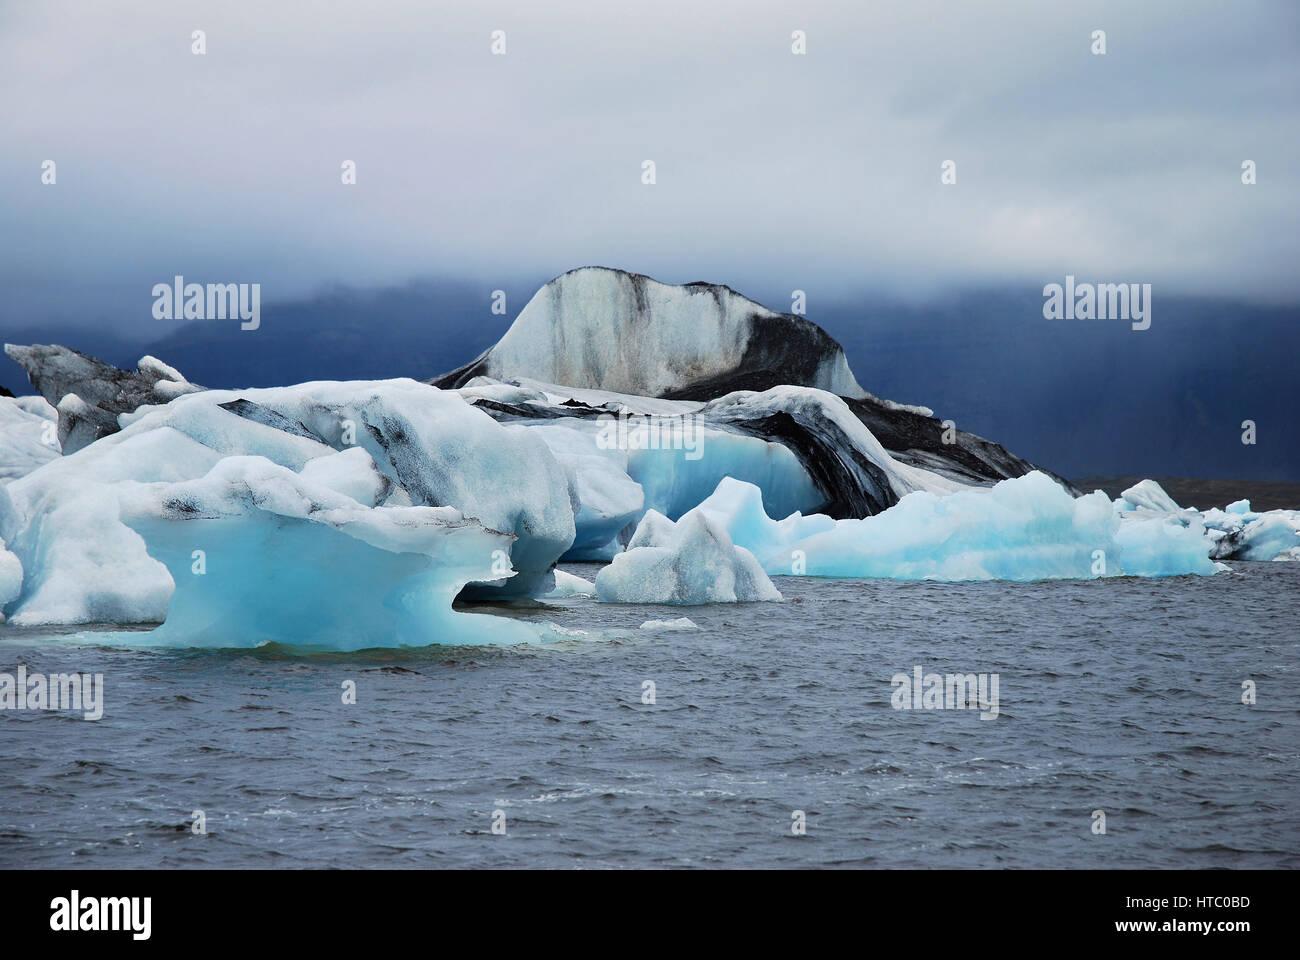 Iceland's Jokulsarlon - glacial lake with blue drifling icebergs on the edge of Vatnajökull National Park, - Stock Image